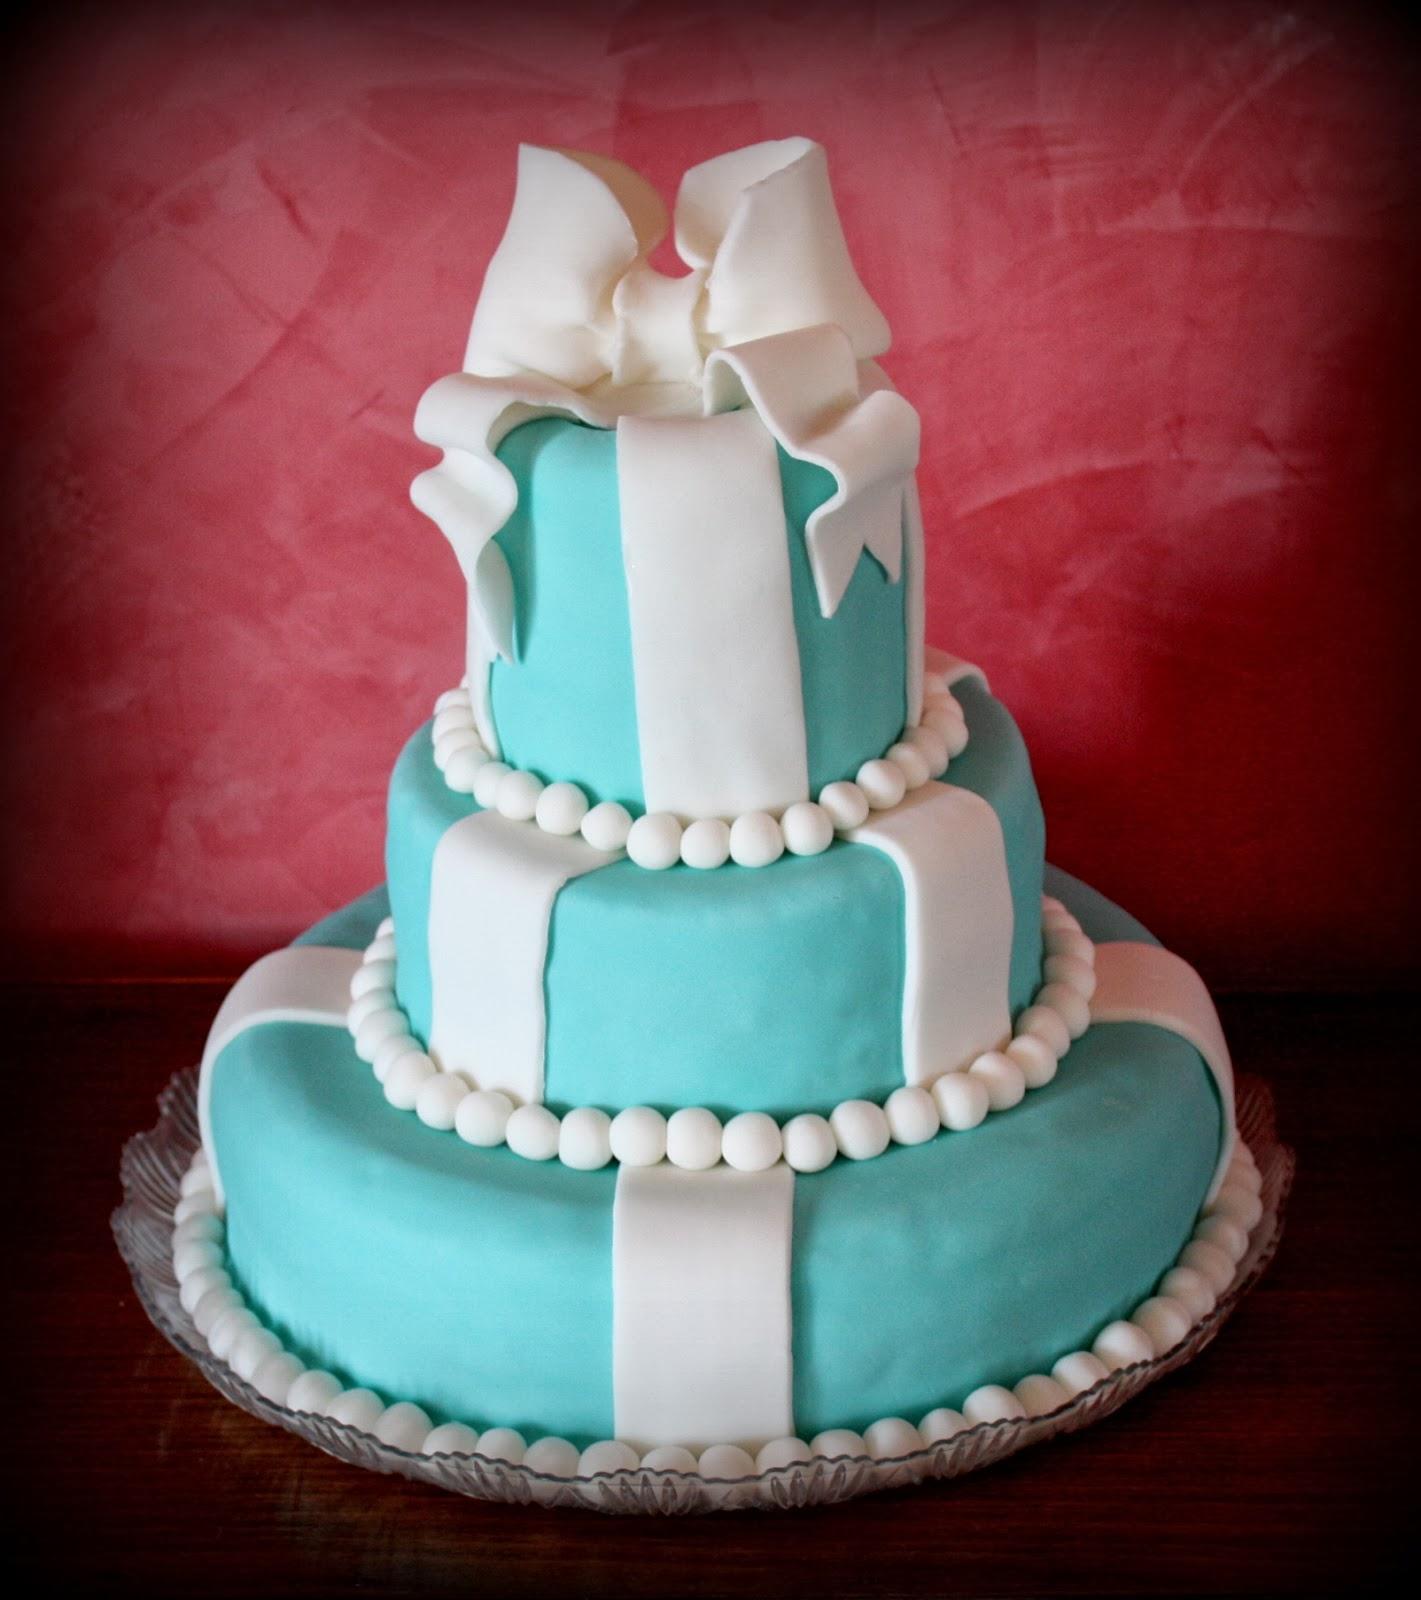 Claudia cakes torta tiffany 3 piani for Piani di coperta a 2 piani